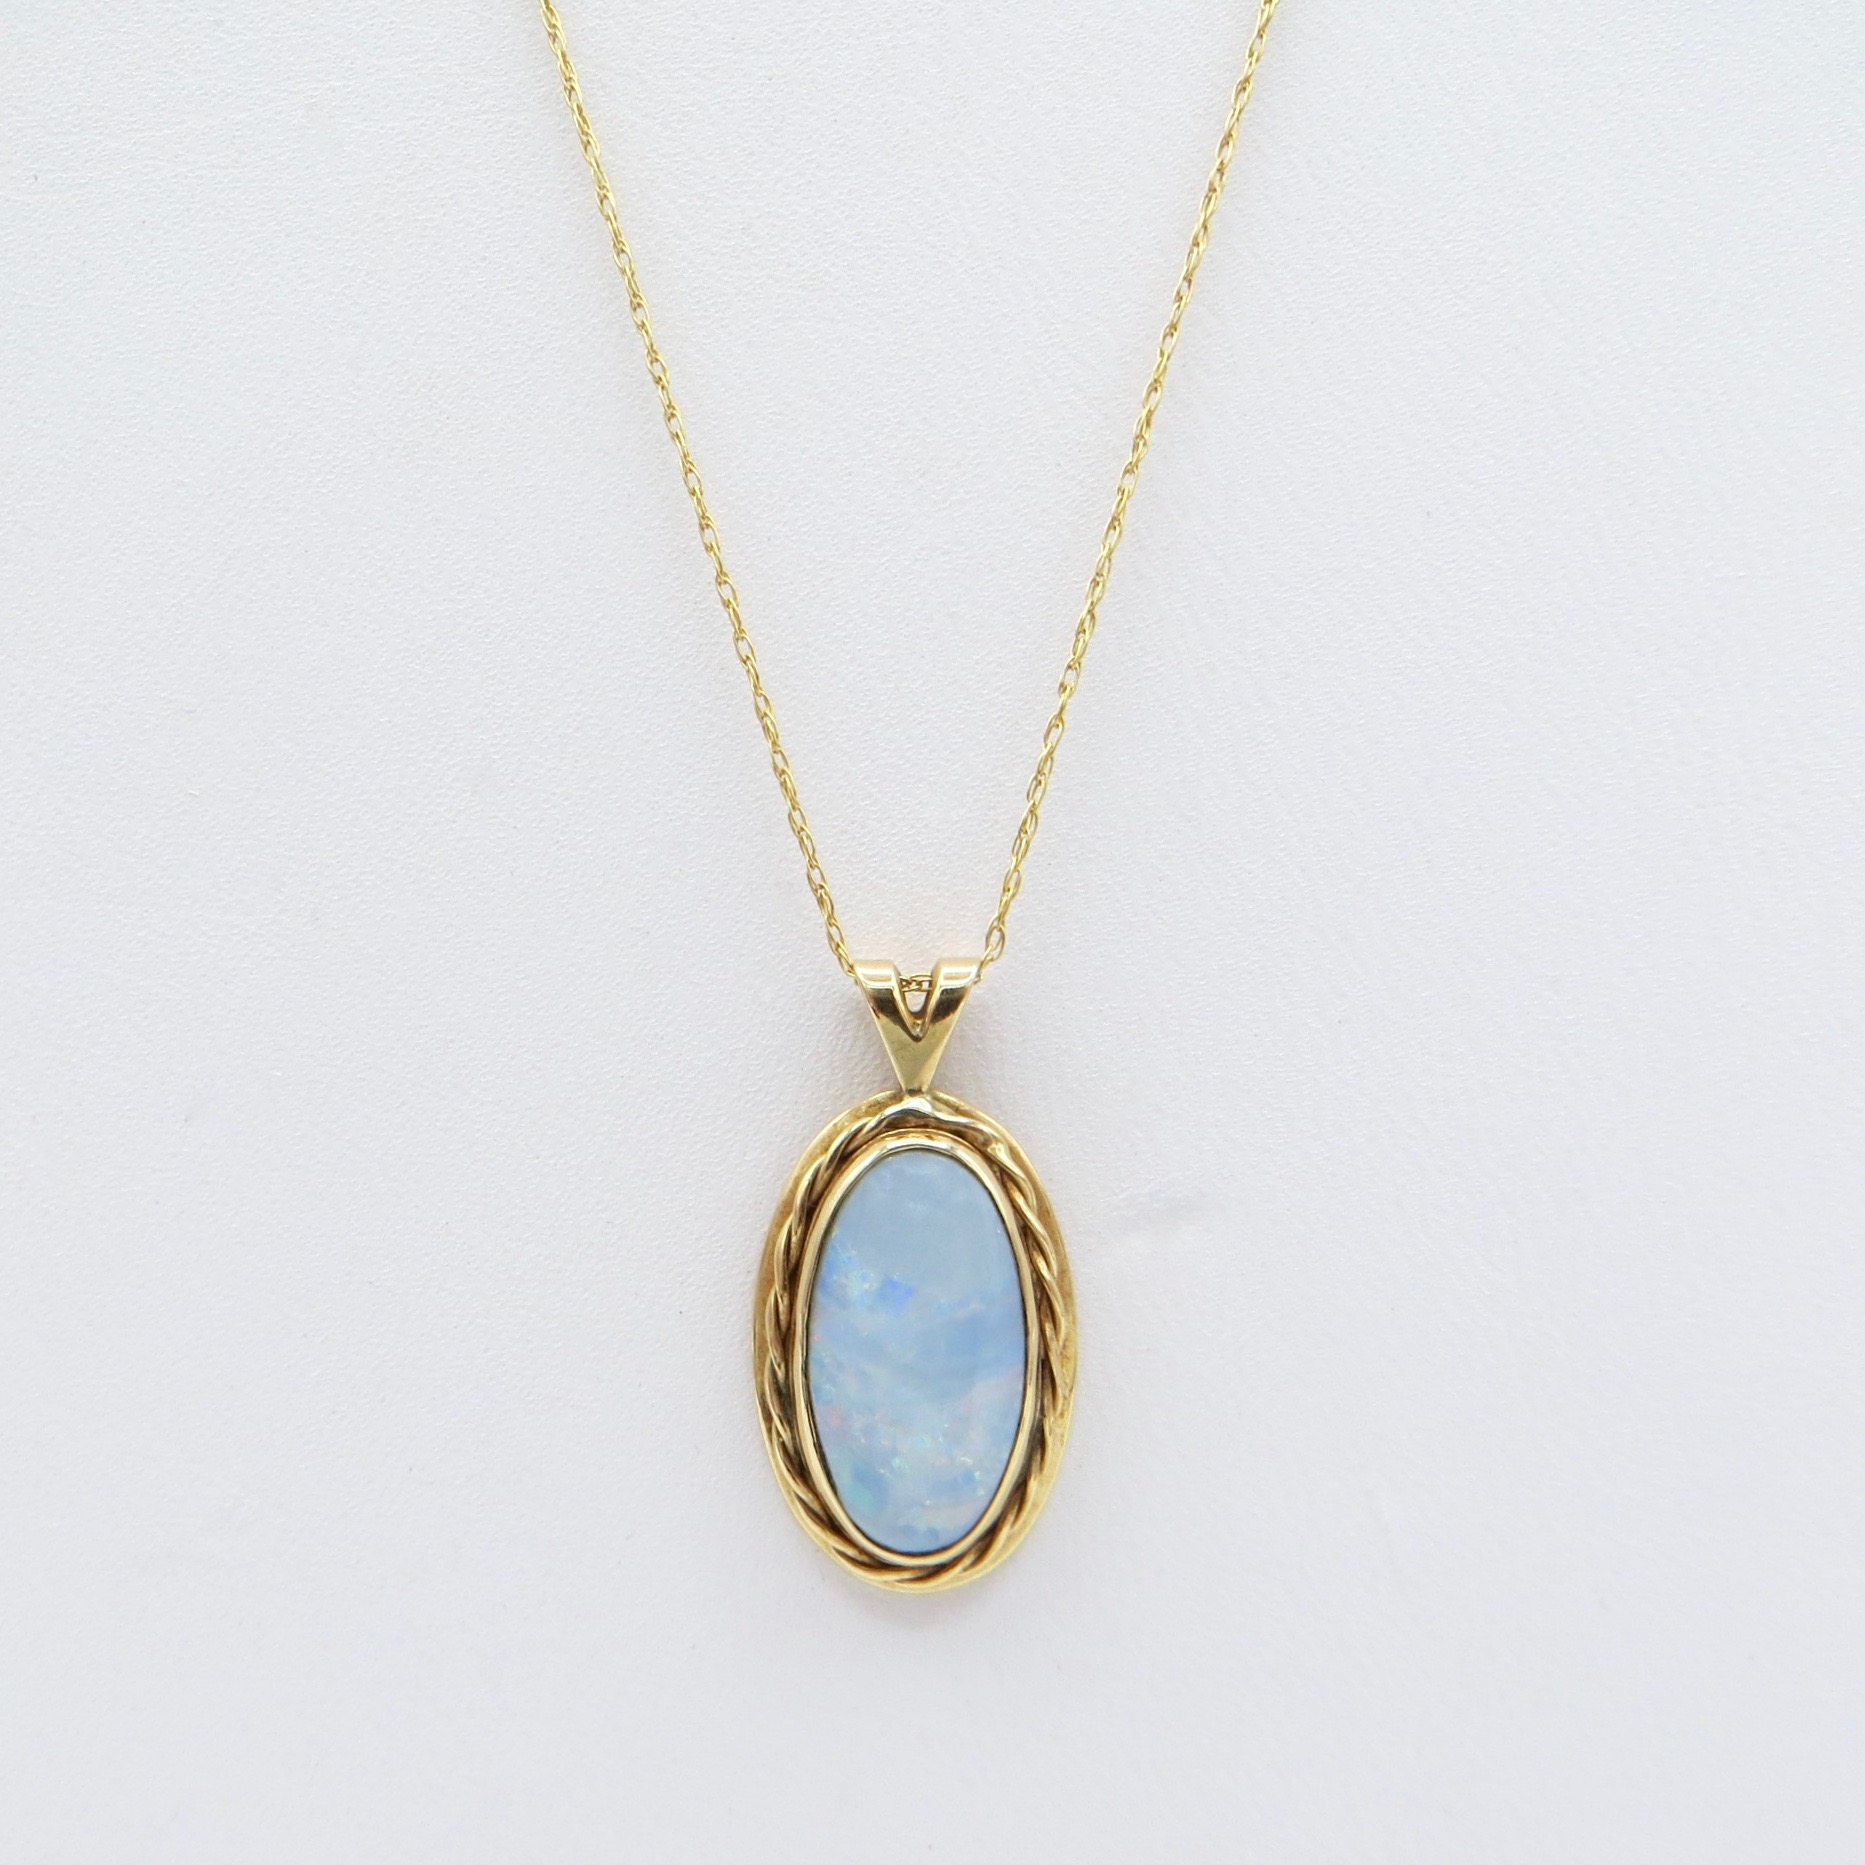 10kt Gold & Opal Necklace